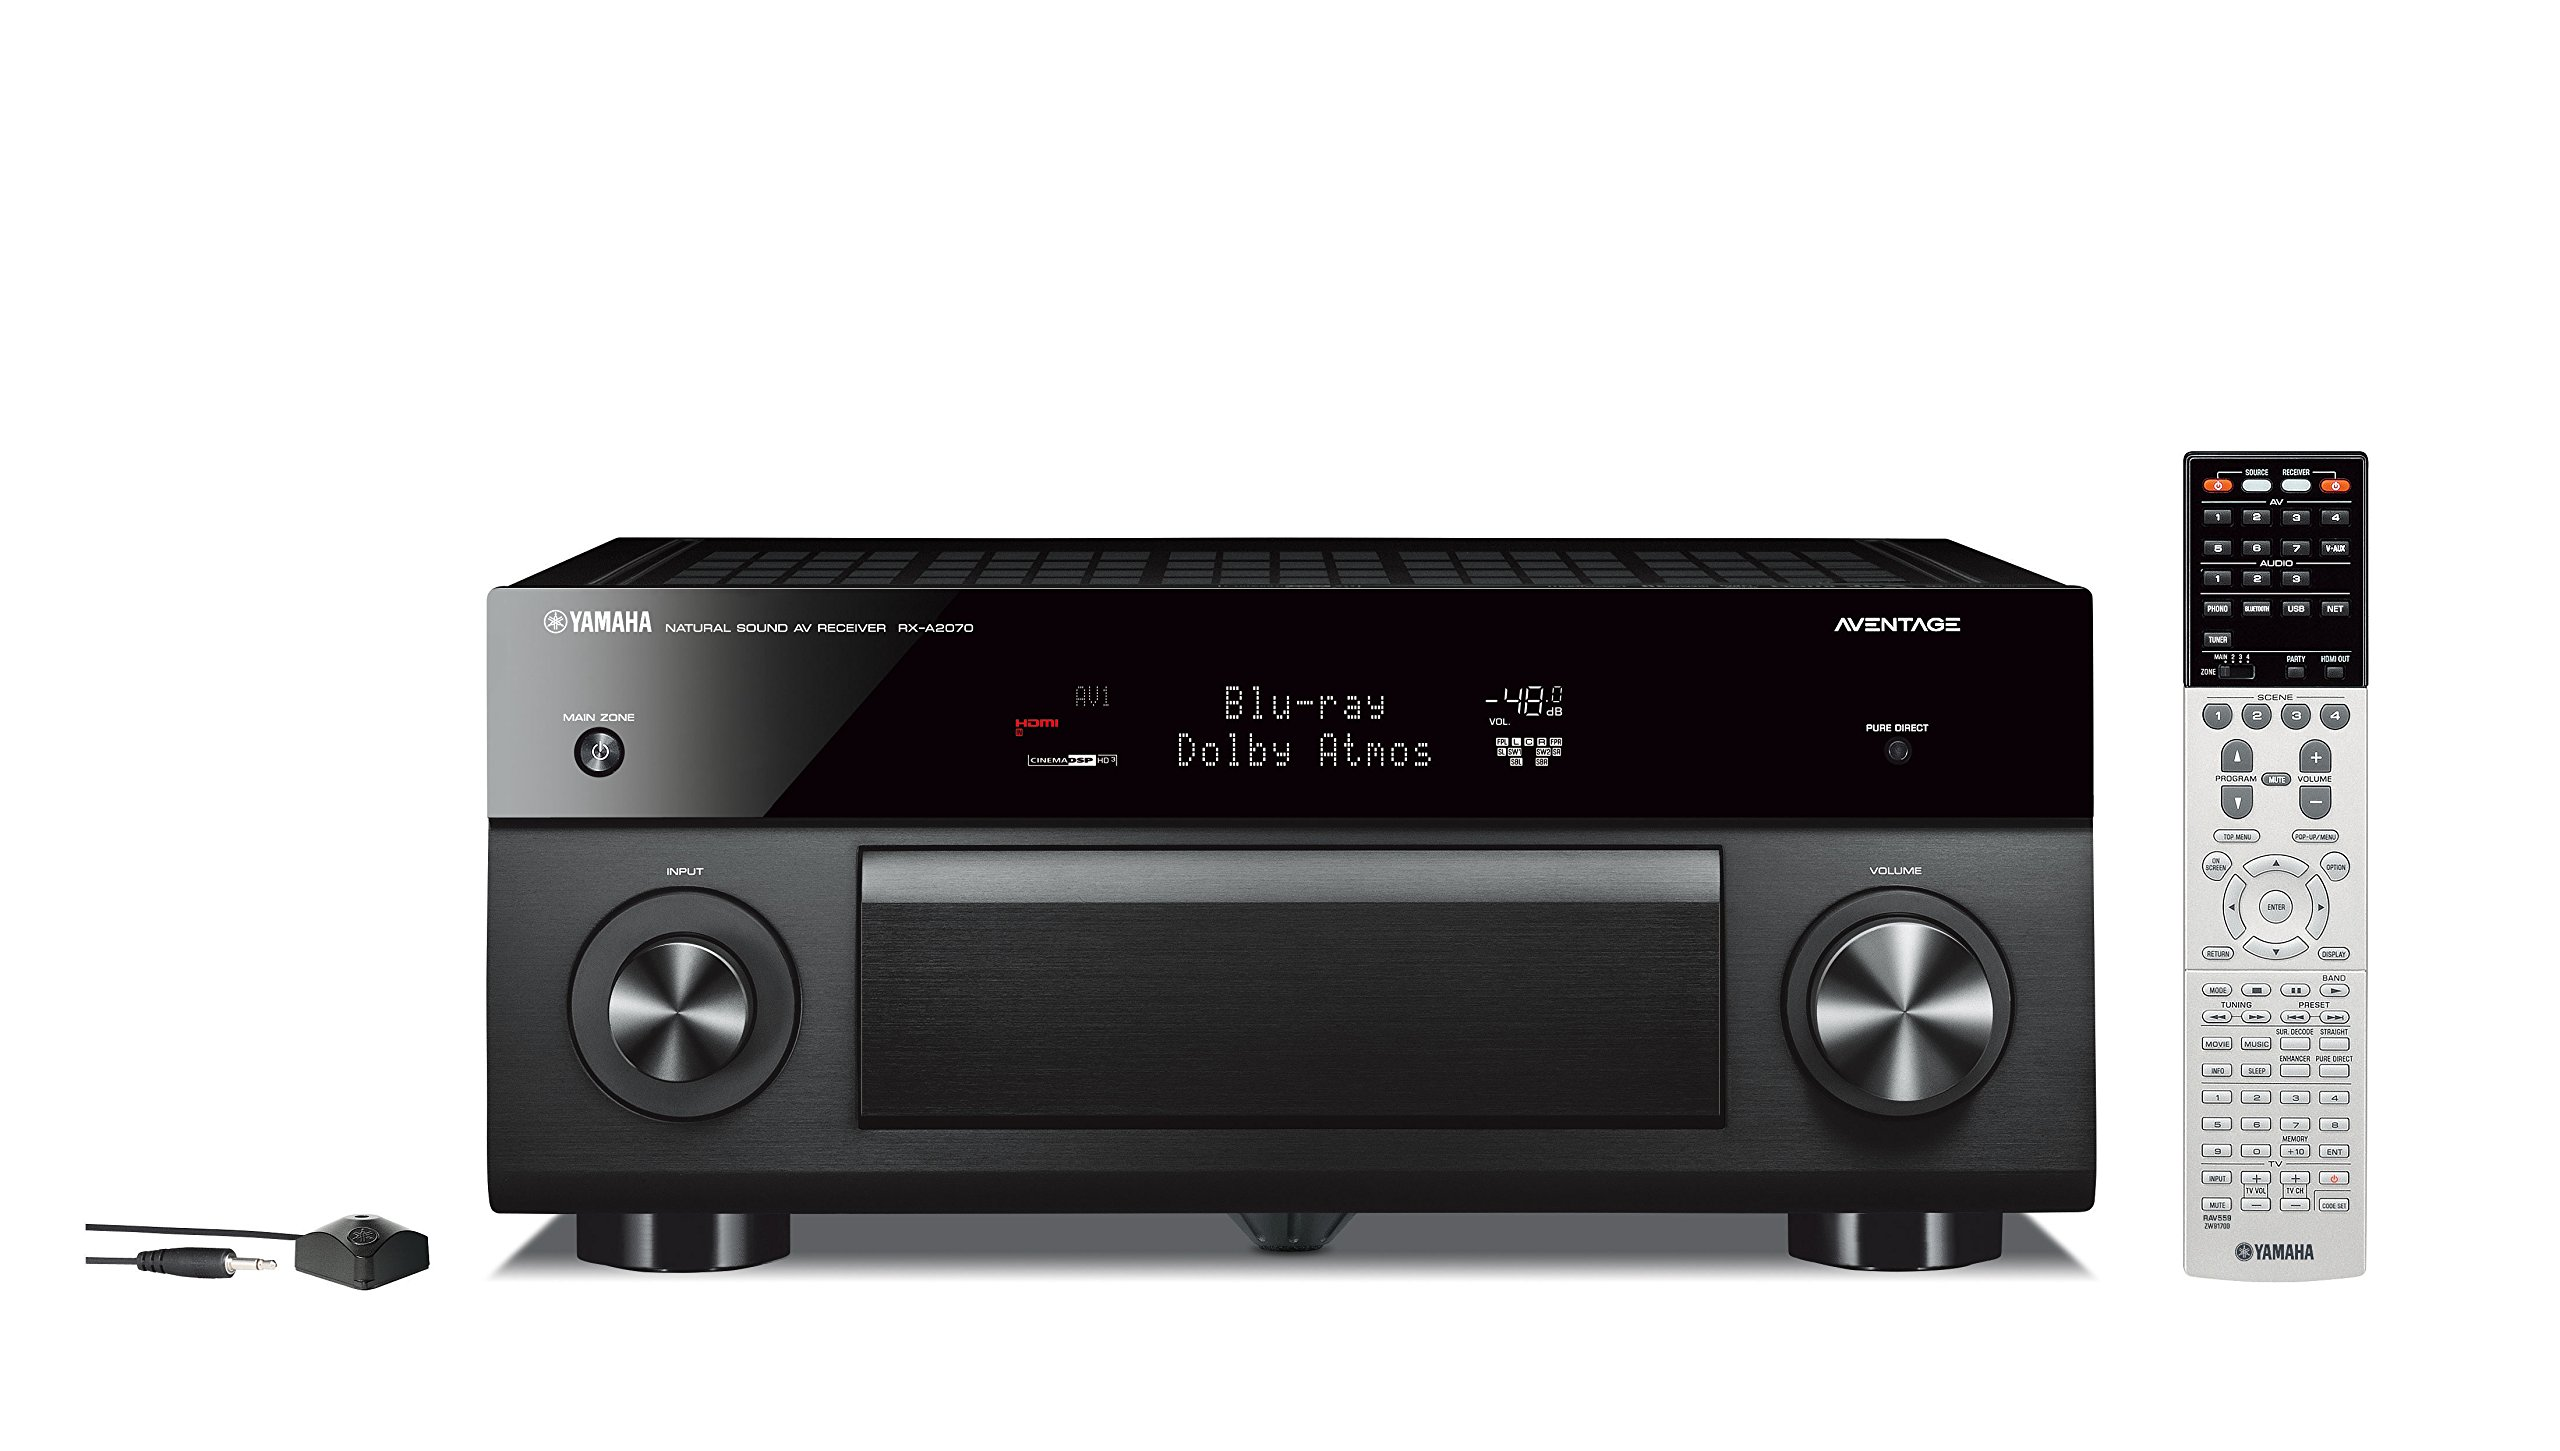 Yamaha AVENTAGE Audio & Video Component Receiver,Black (RX-A2070BL)